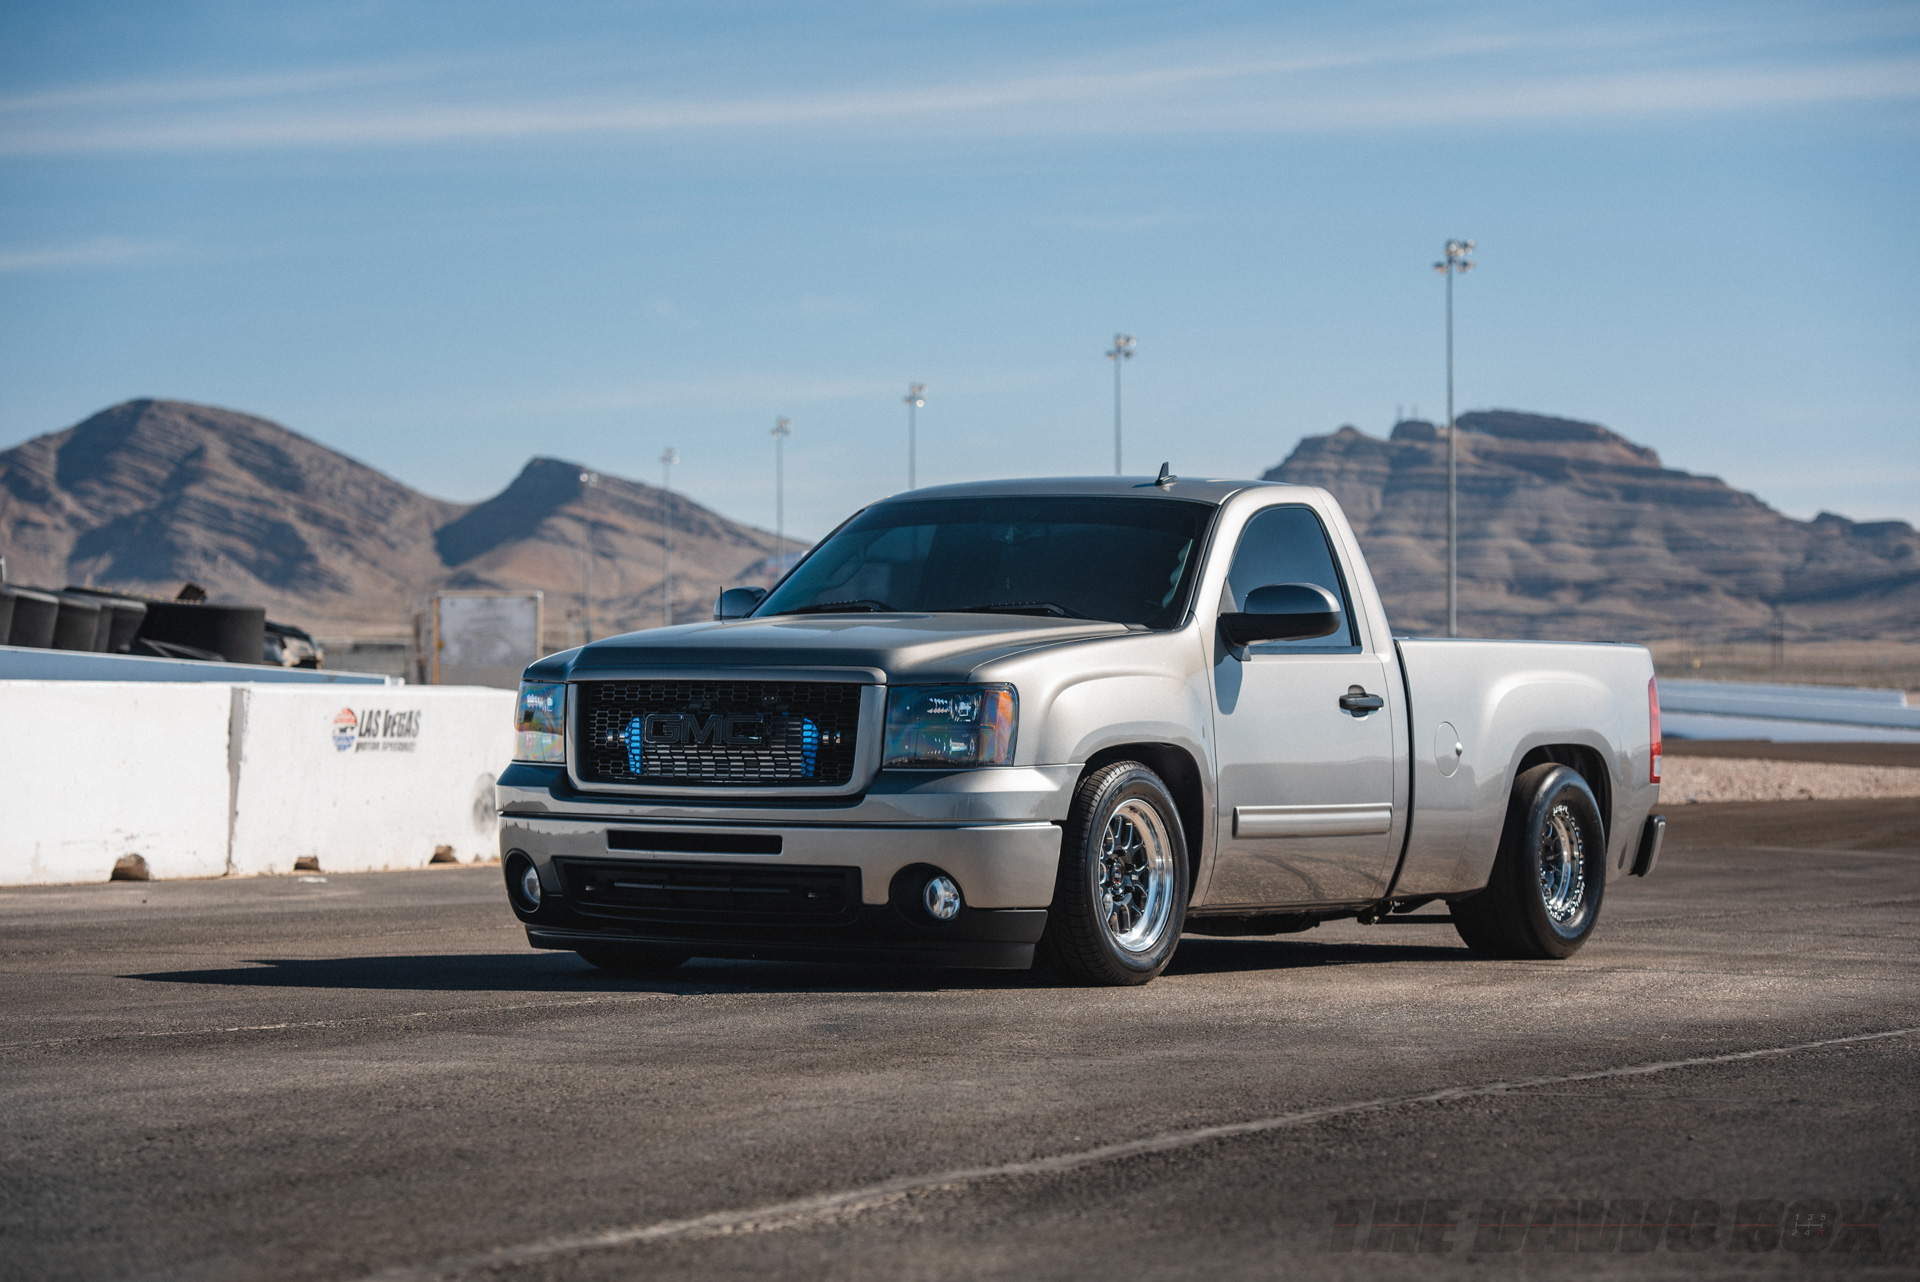 Custom Grey GMC pickup truck